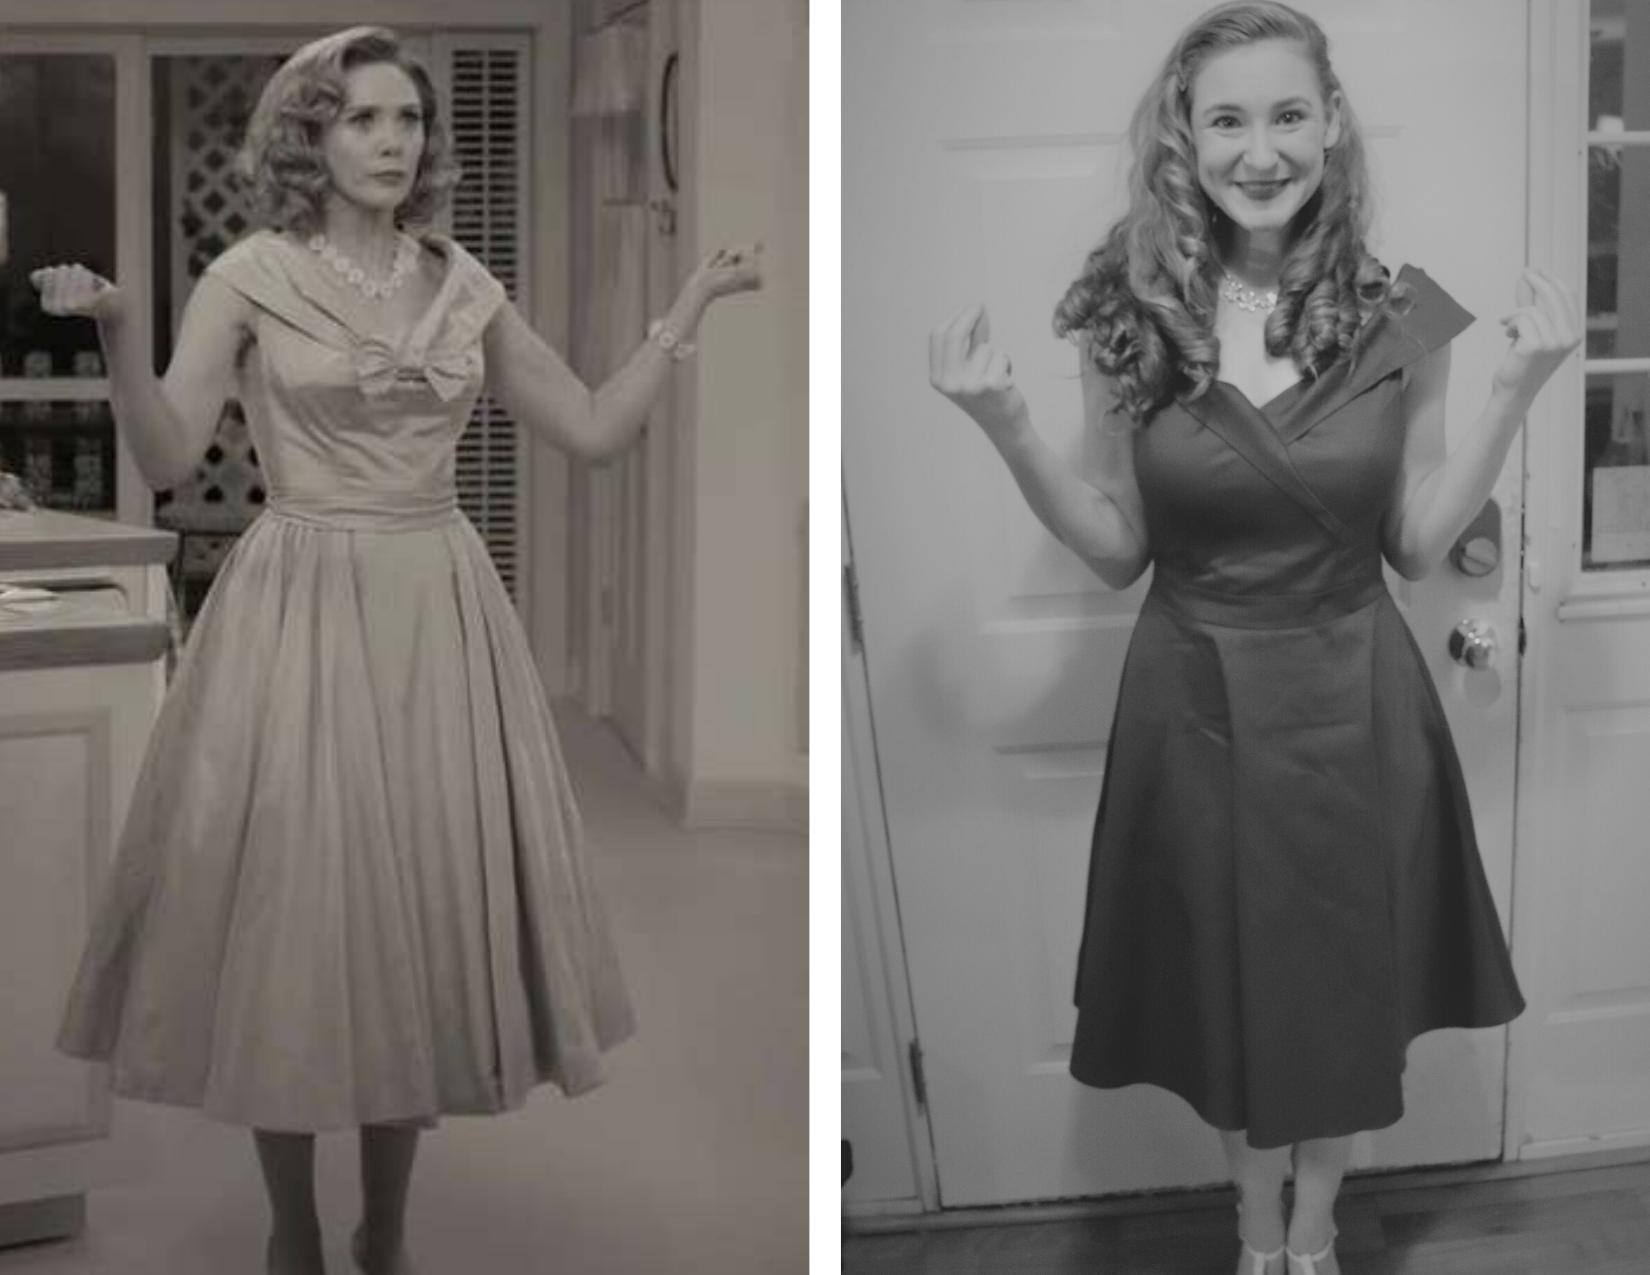 WandaVision disneybound 1950s - Disney in your Day